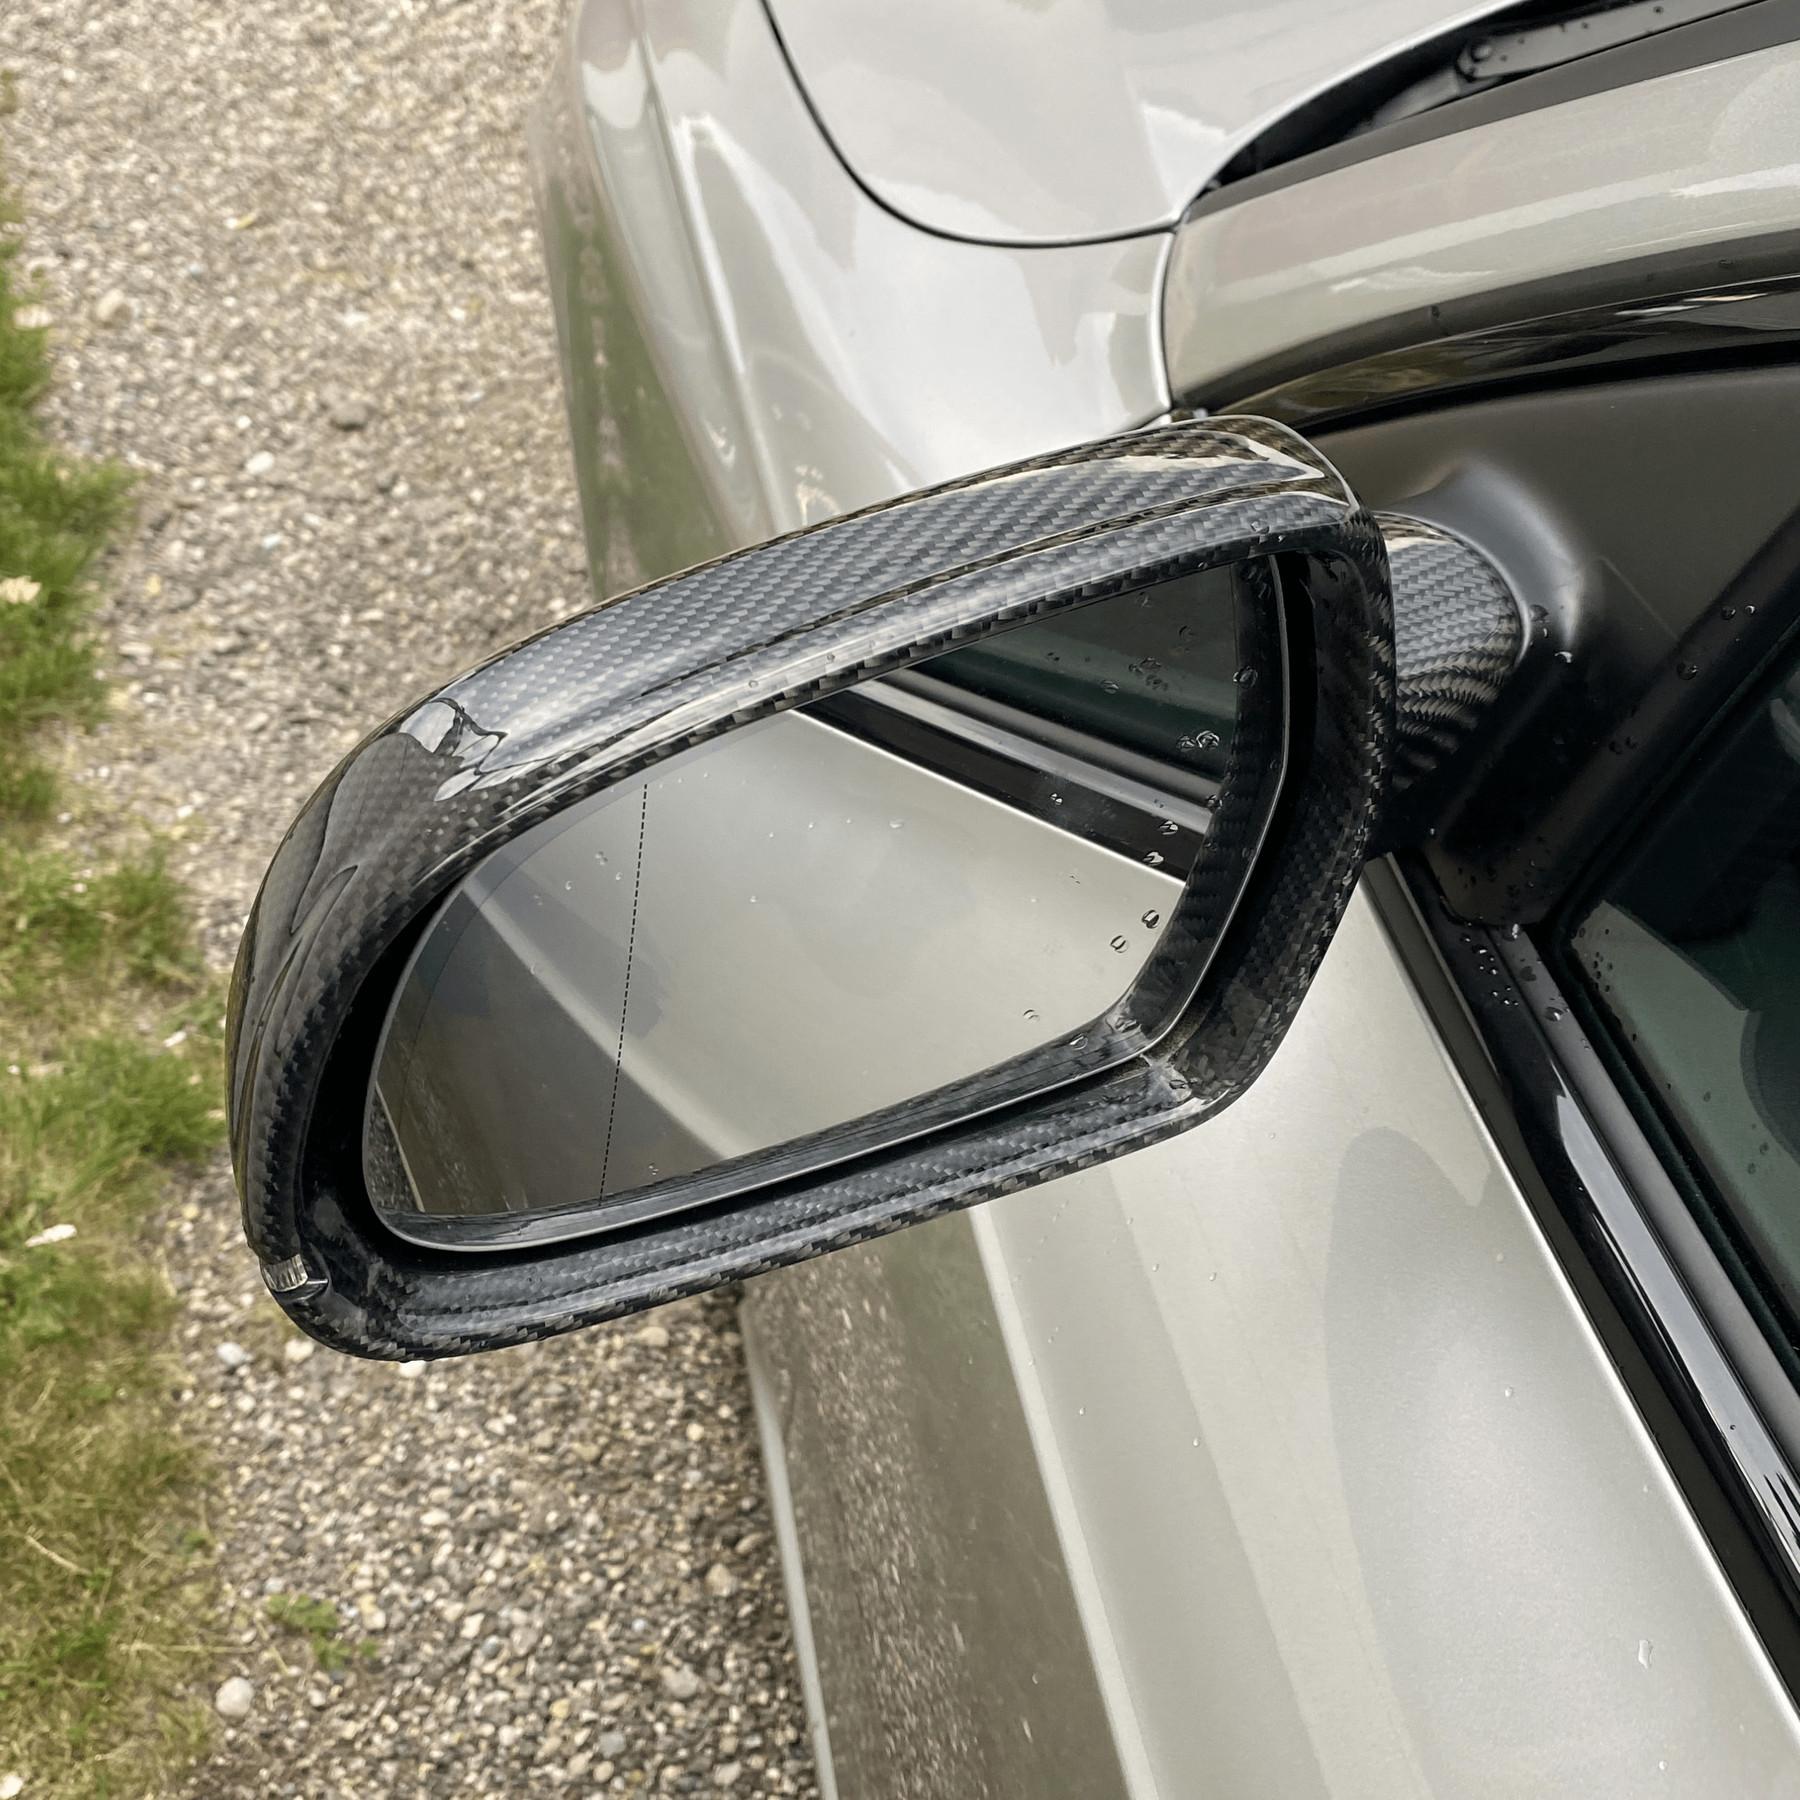 NEU Alu Optik Look Spiegelkappen für Audi A5 S5 RS5 8T 2007–10 AUCH SIDE ASSIST!